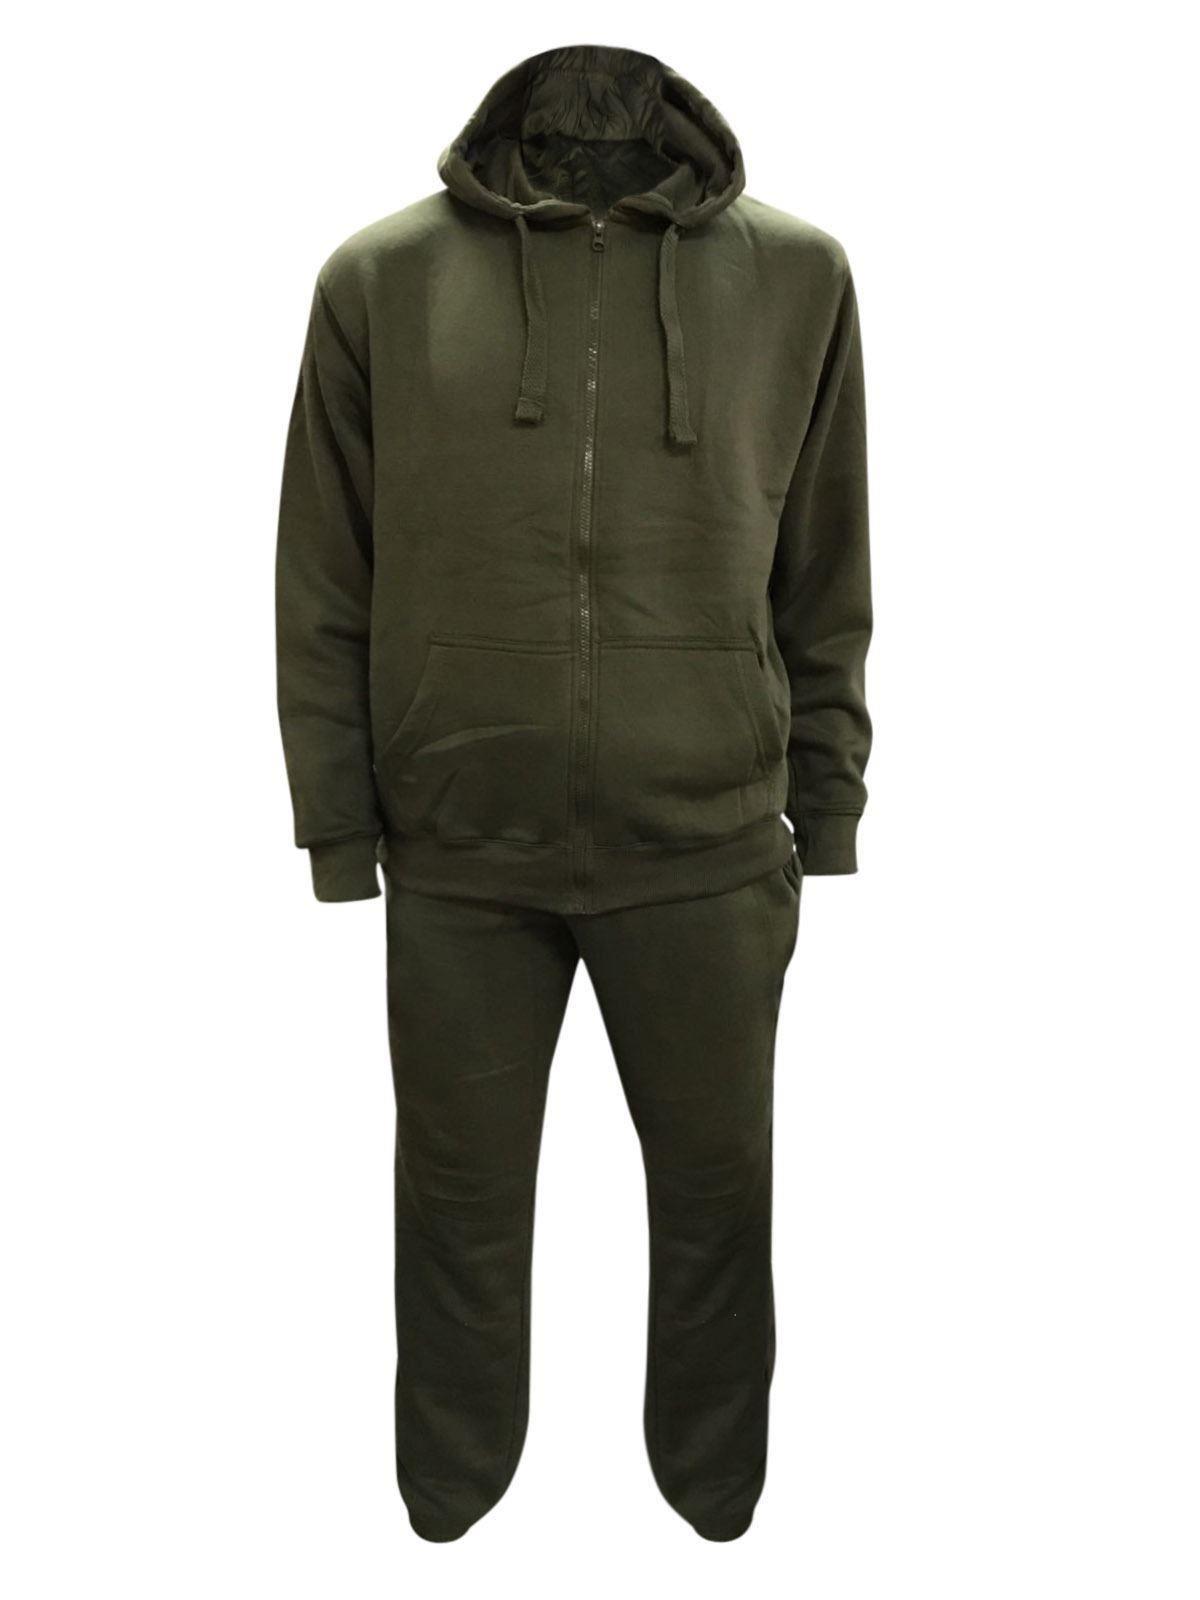 NEW Mens Plain Hooded Tracksuit Sweat Zip Top /& Jog Track Bottoms S M L XL